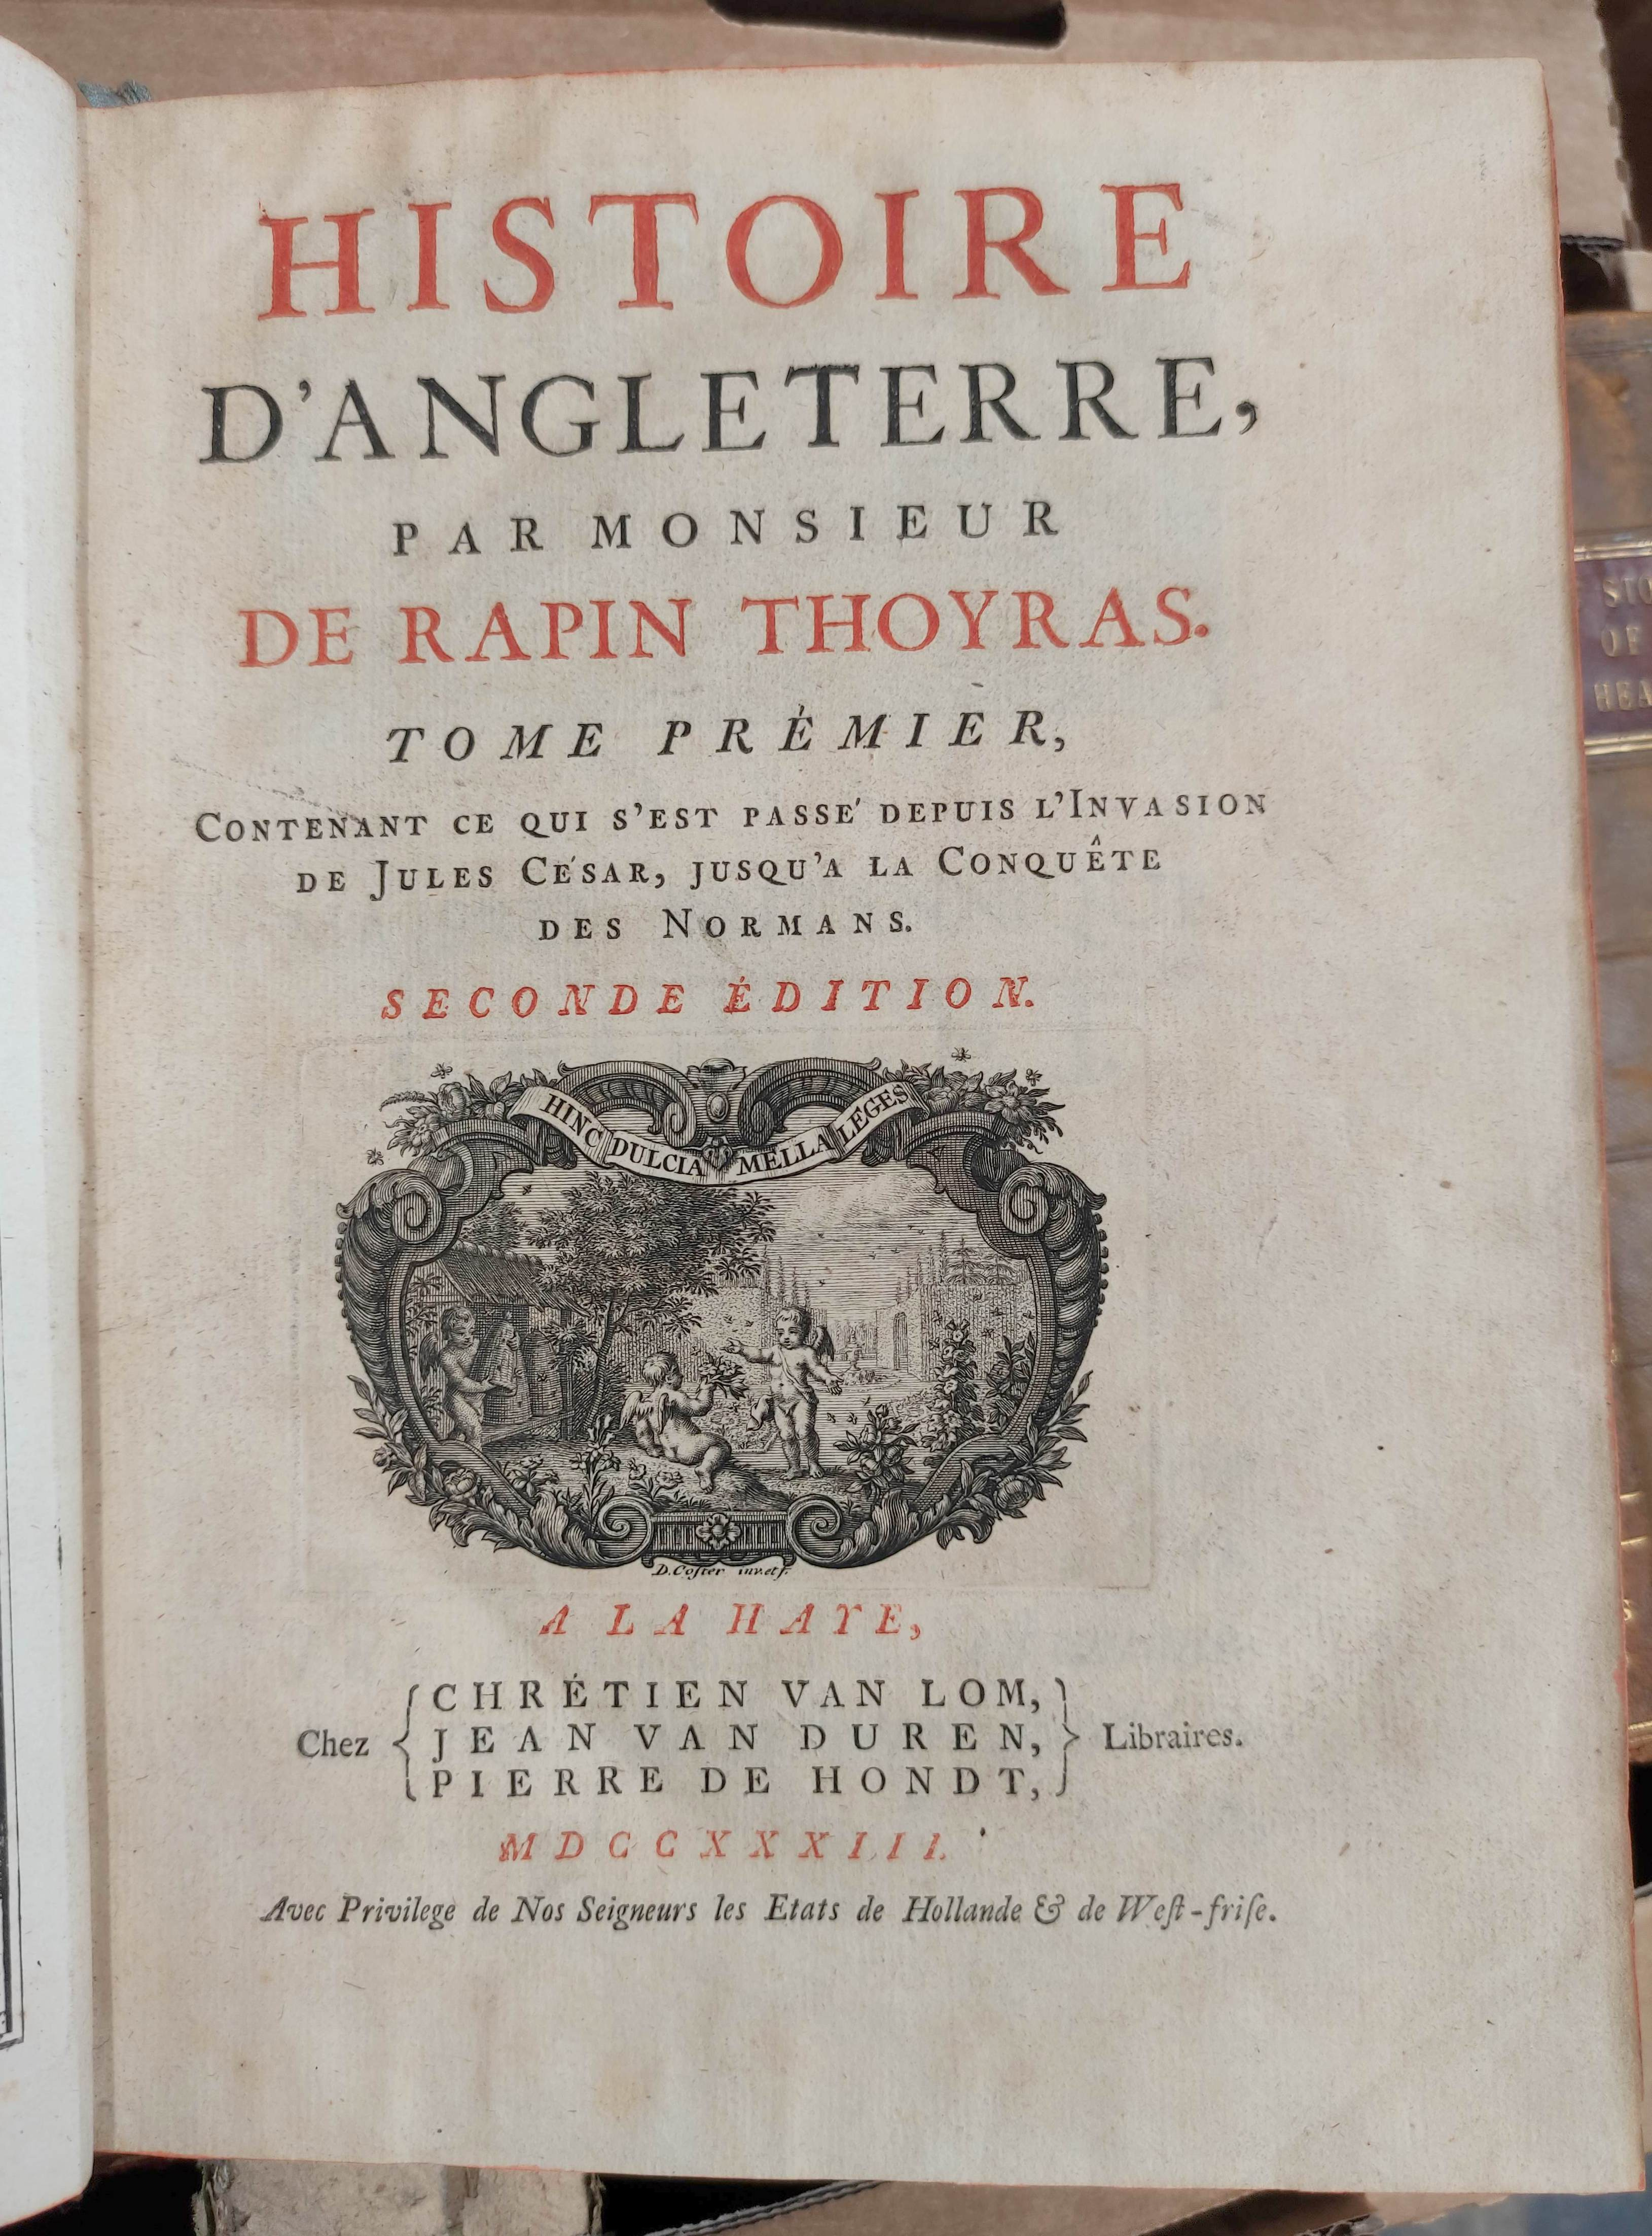 DE RAPIN THOYRAS.Histoire D'Angleterre. 10 vols. Eng. plates, fldg. tables, etc. Quarto. Calf. The - Image 3 of 8